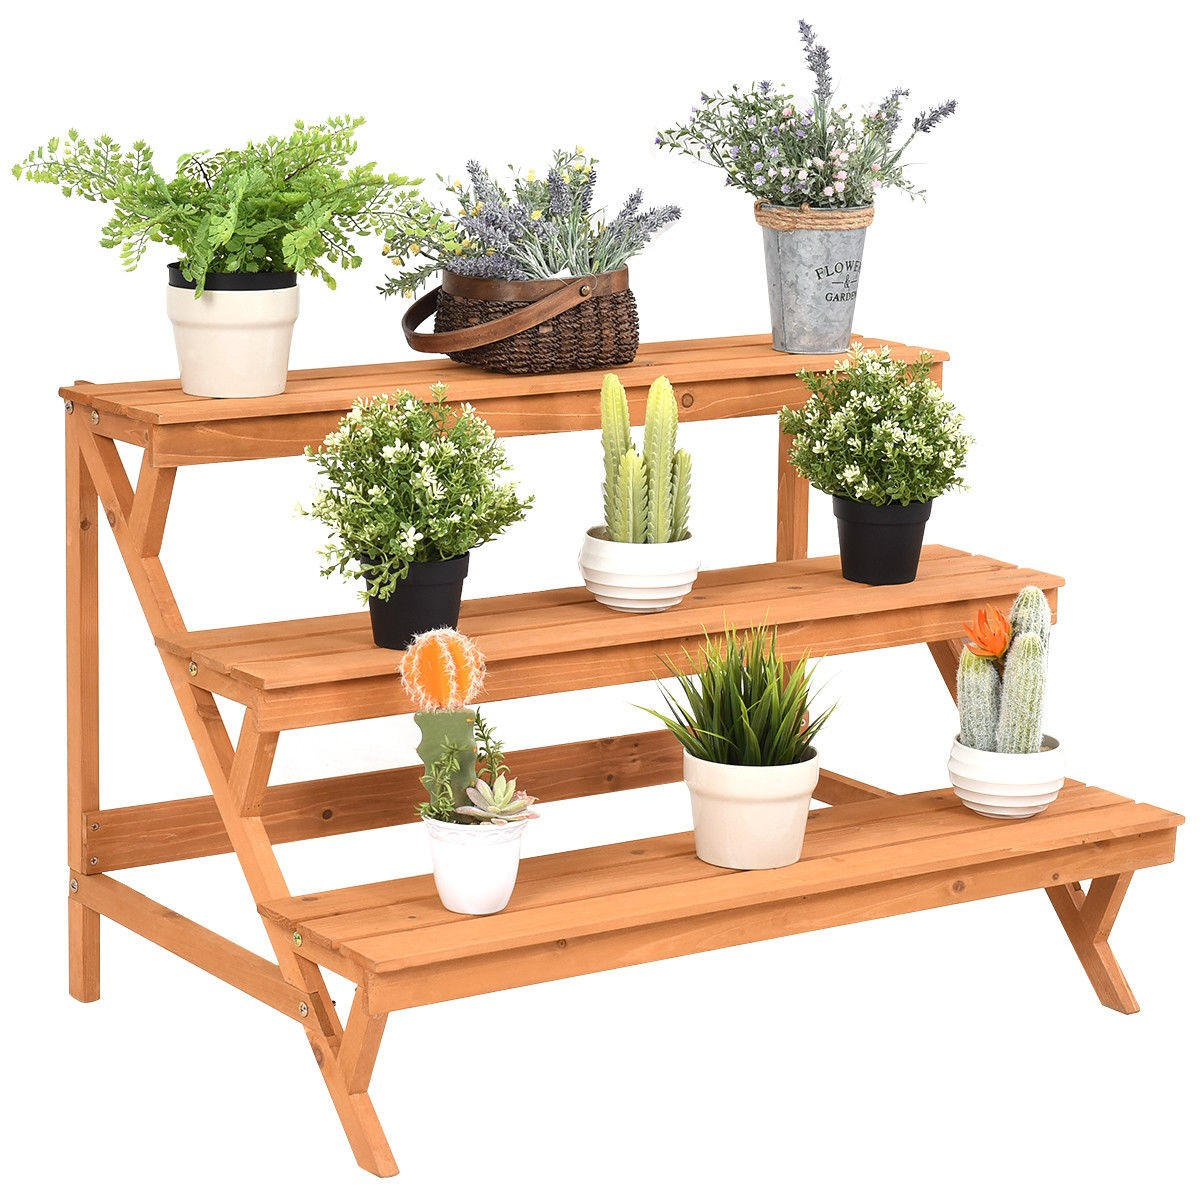 3 Tier Garden Wooden Step Ladder Plant Pot Rack Display